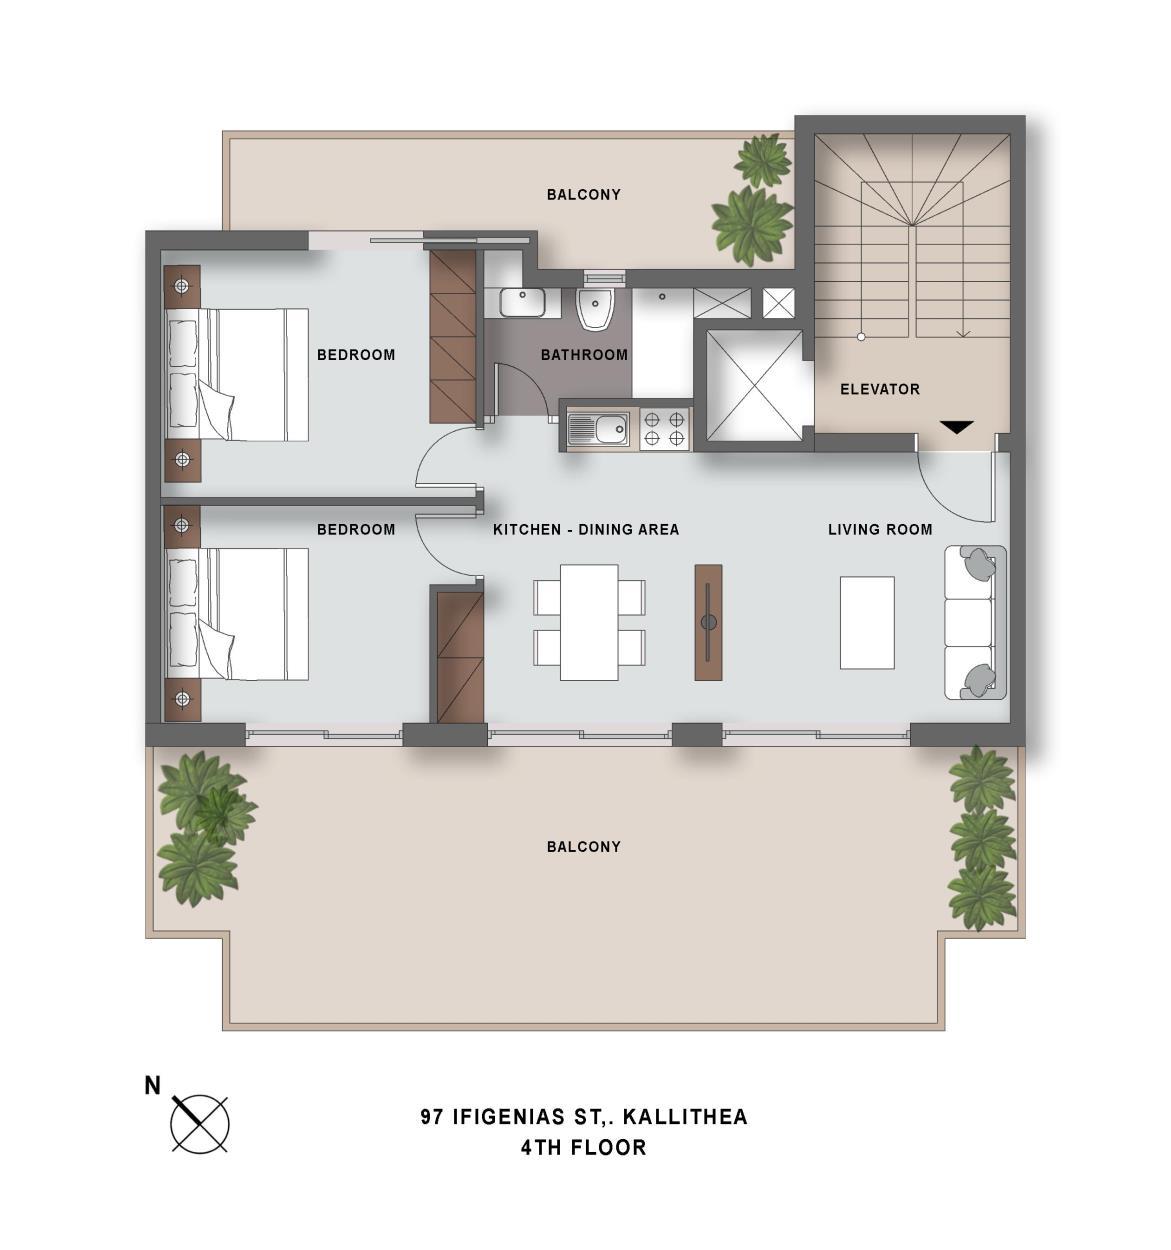 Ifigeneias 97 4th floor plan